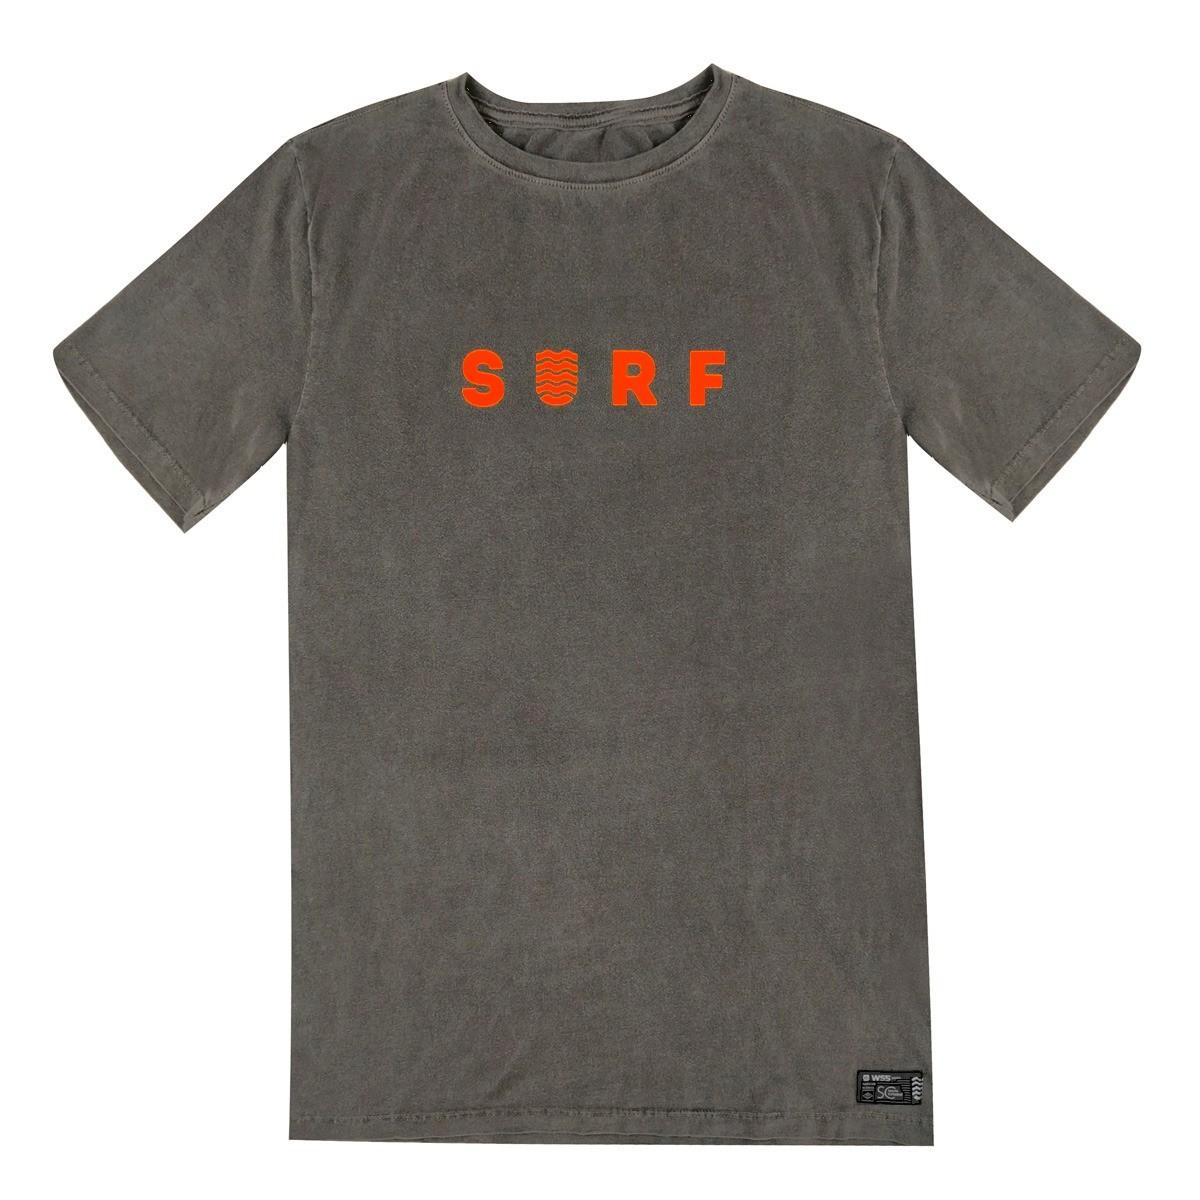 Camiseta Wss Estonada Cinza Surf Neon Orange Masculino